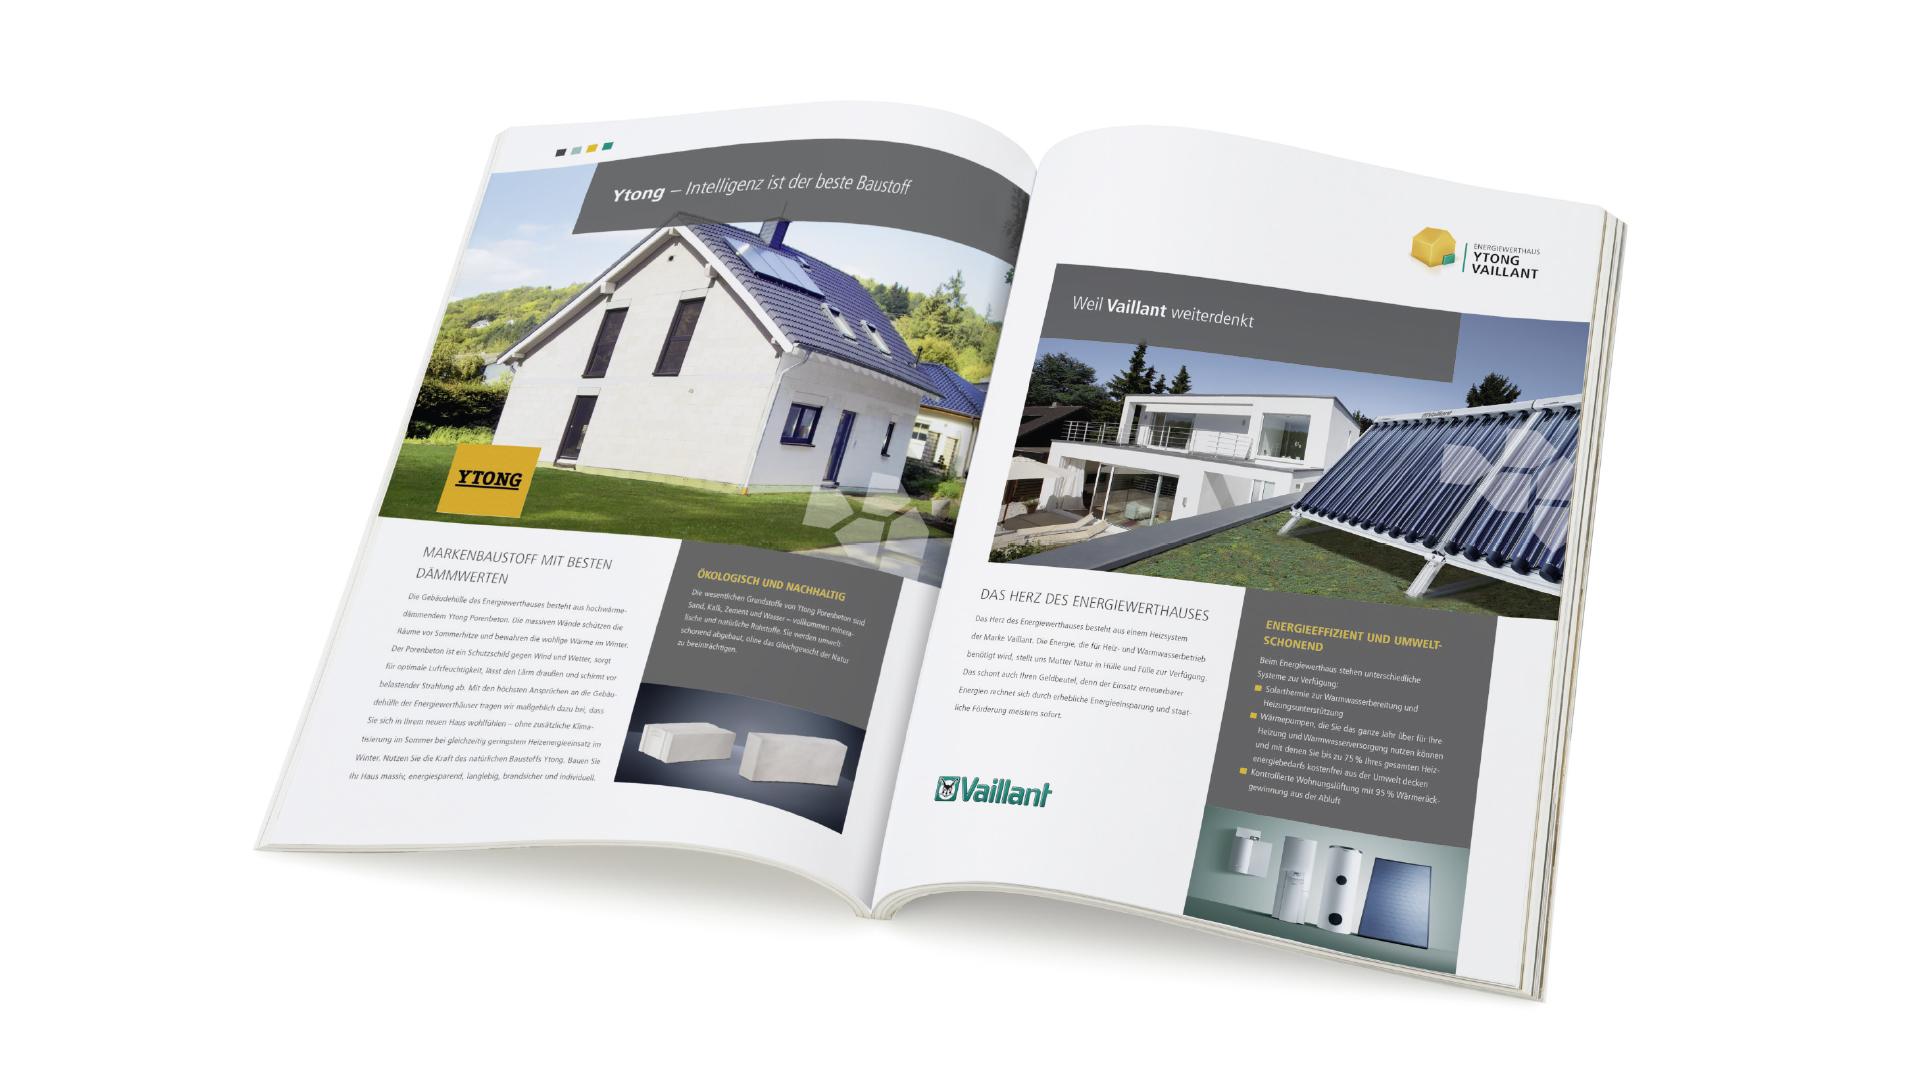 Relaunch Energiewerthaus Ytong Vaillant Inhalt 2